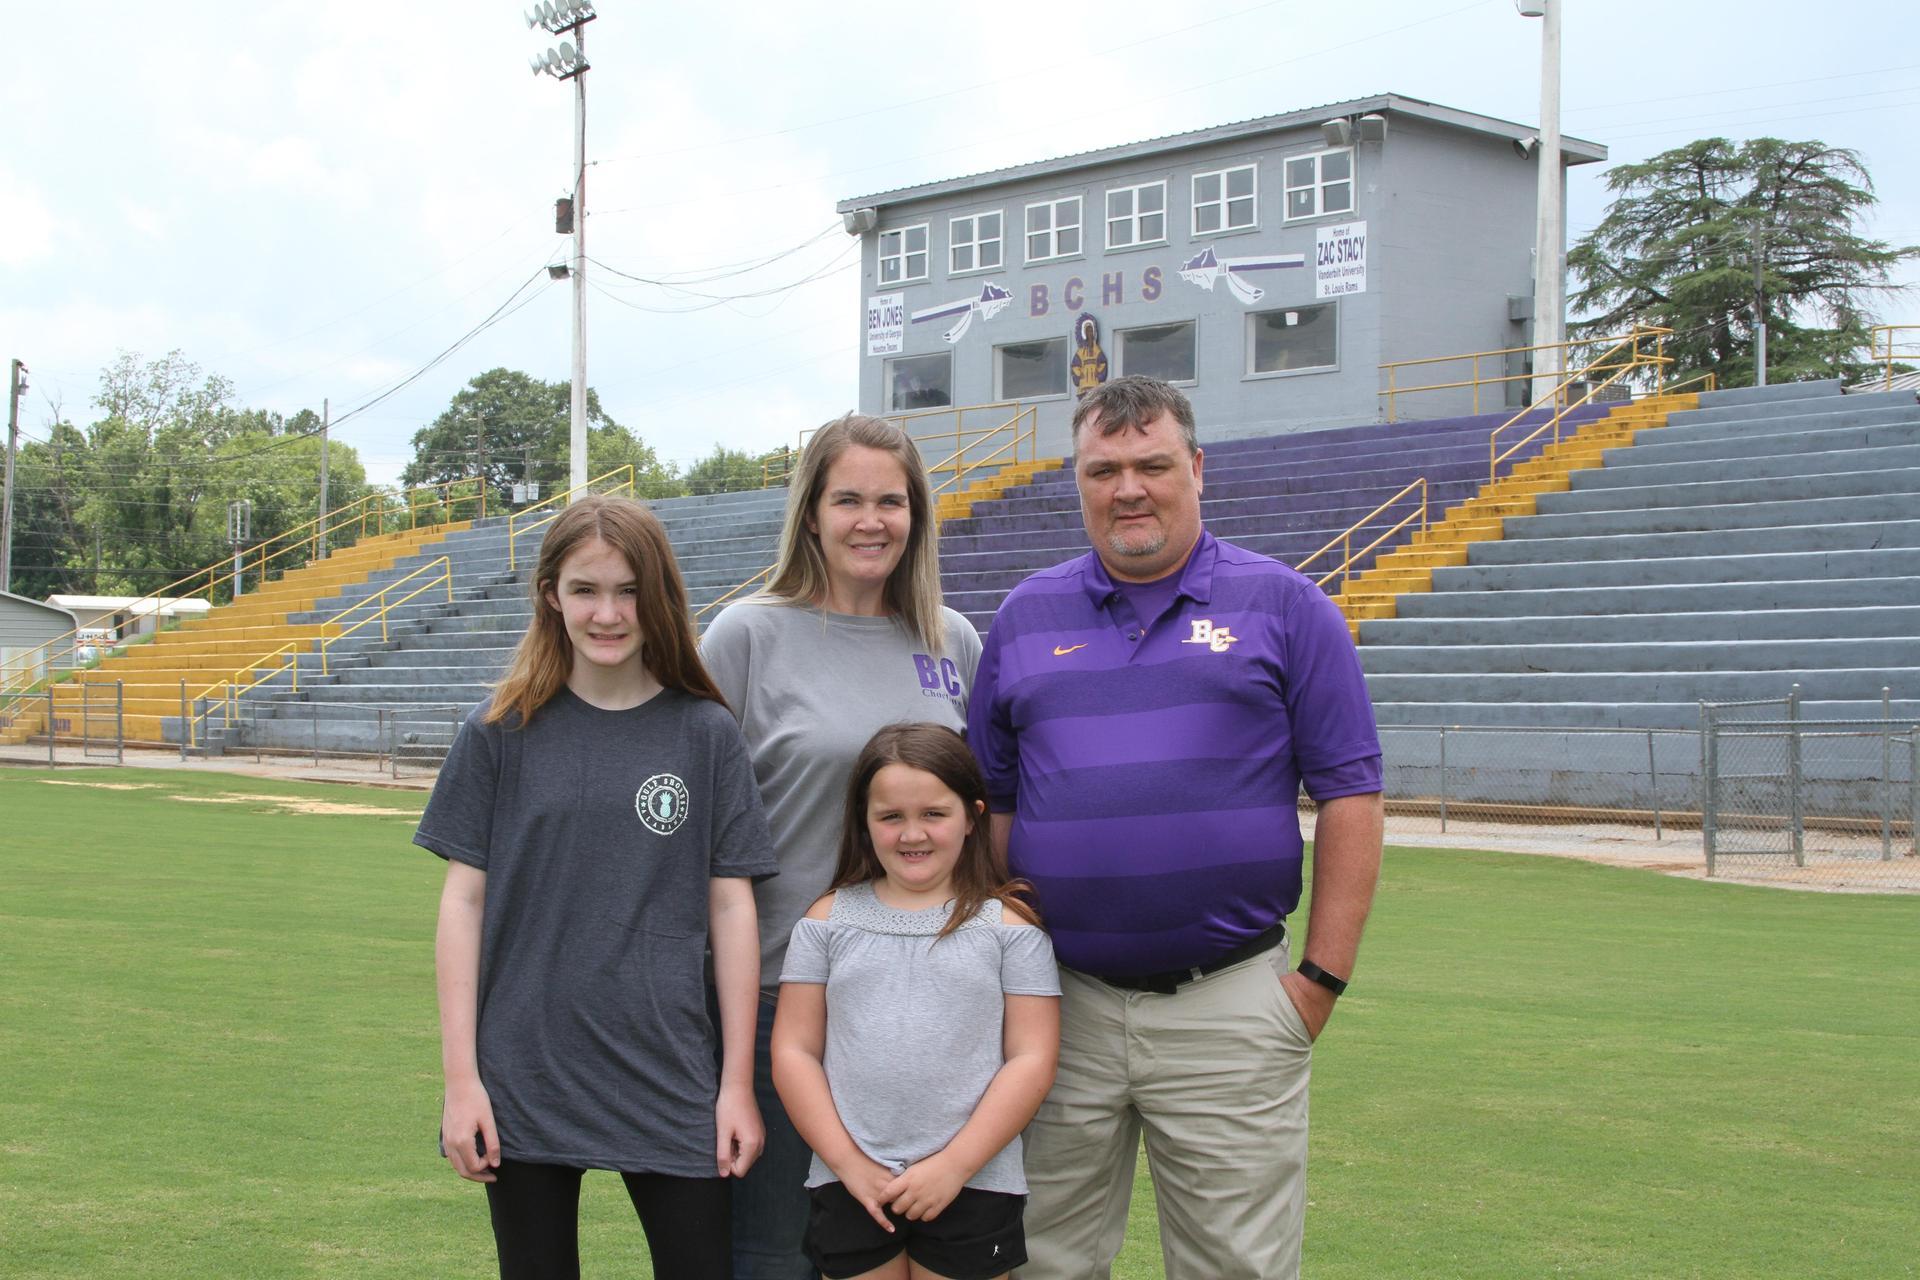 Daniel Payne and Family